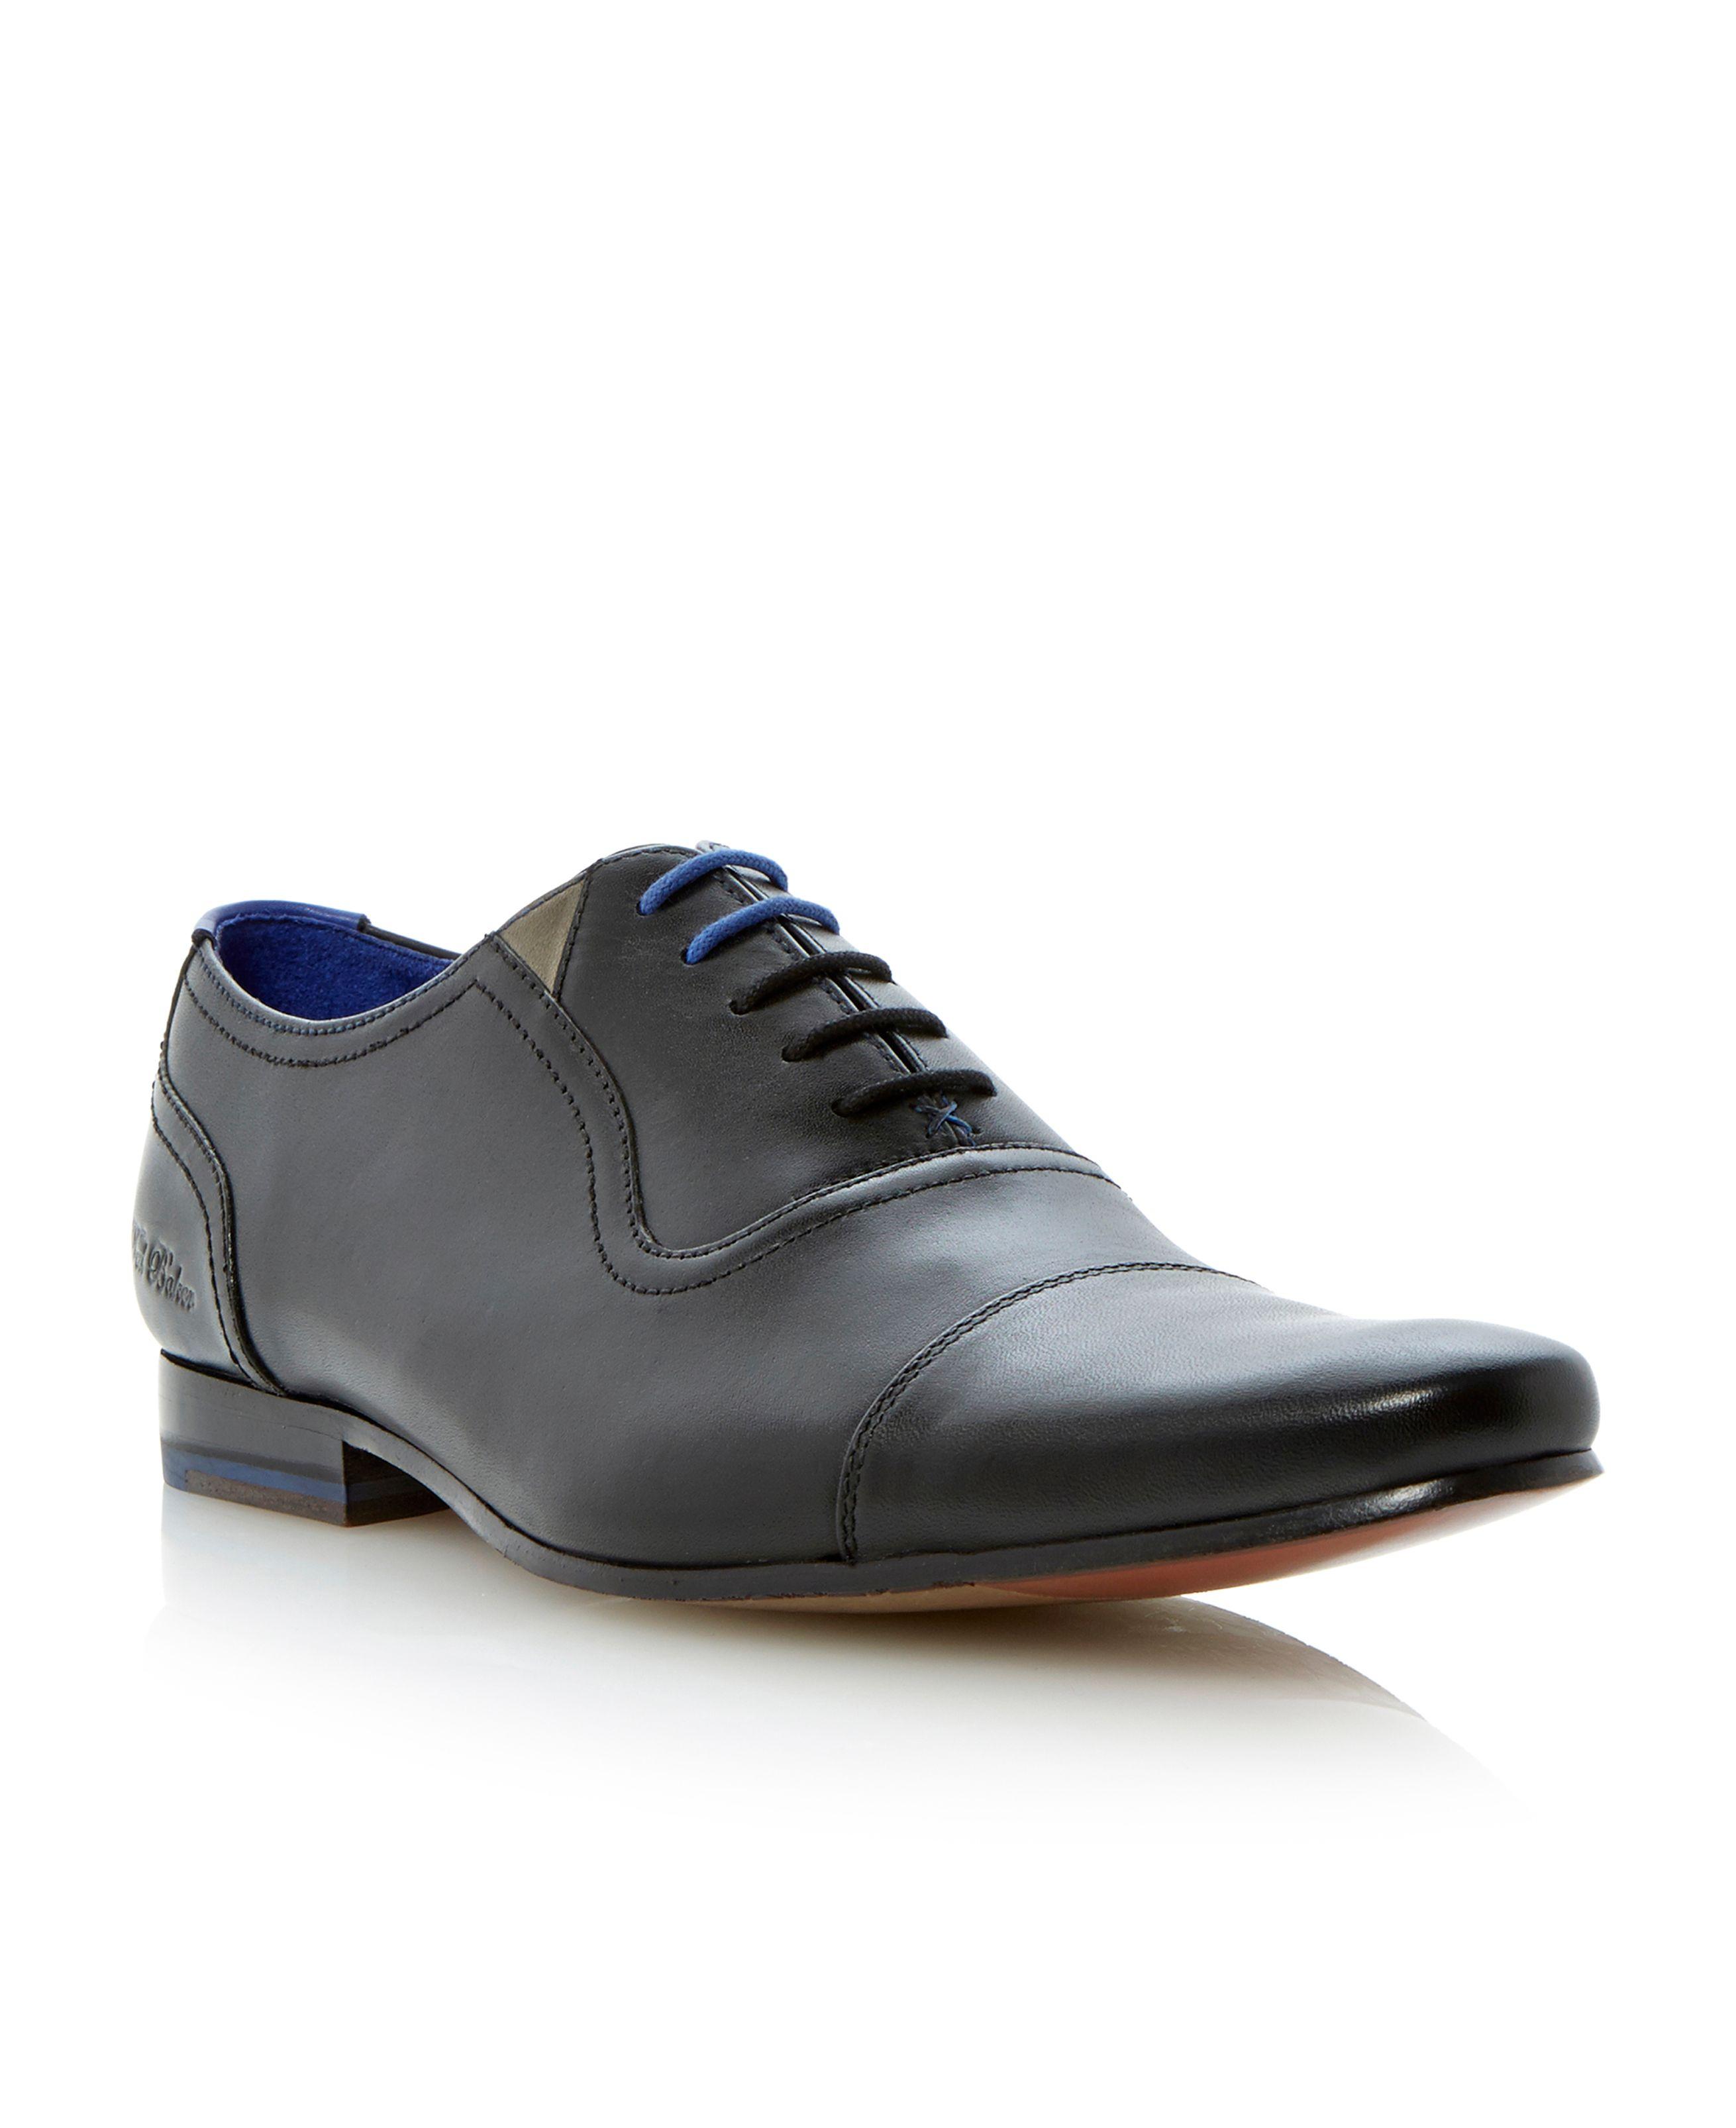 ted baker shoes blue laces